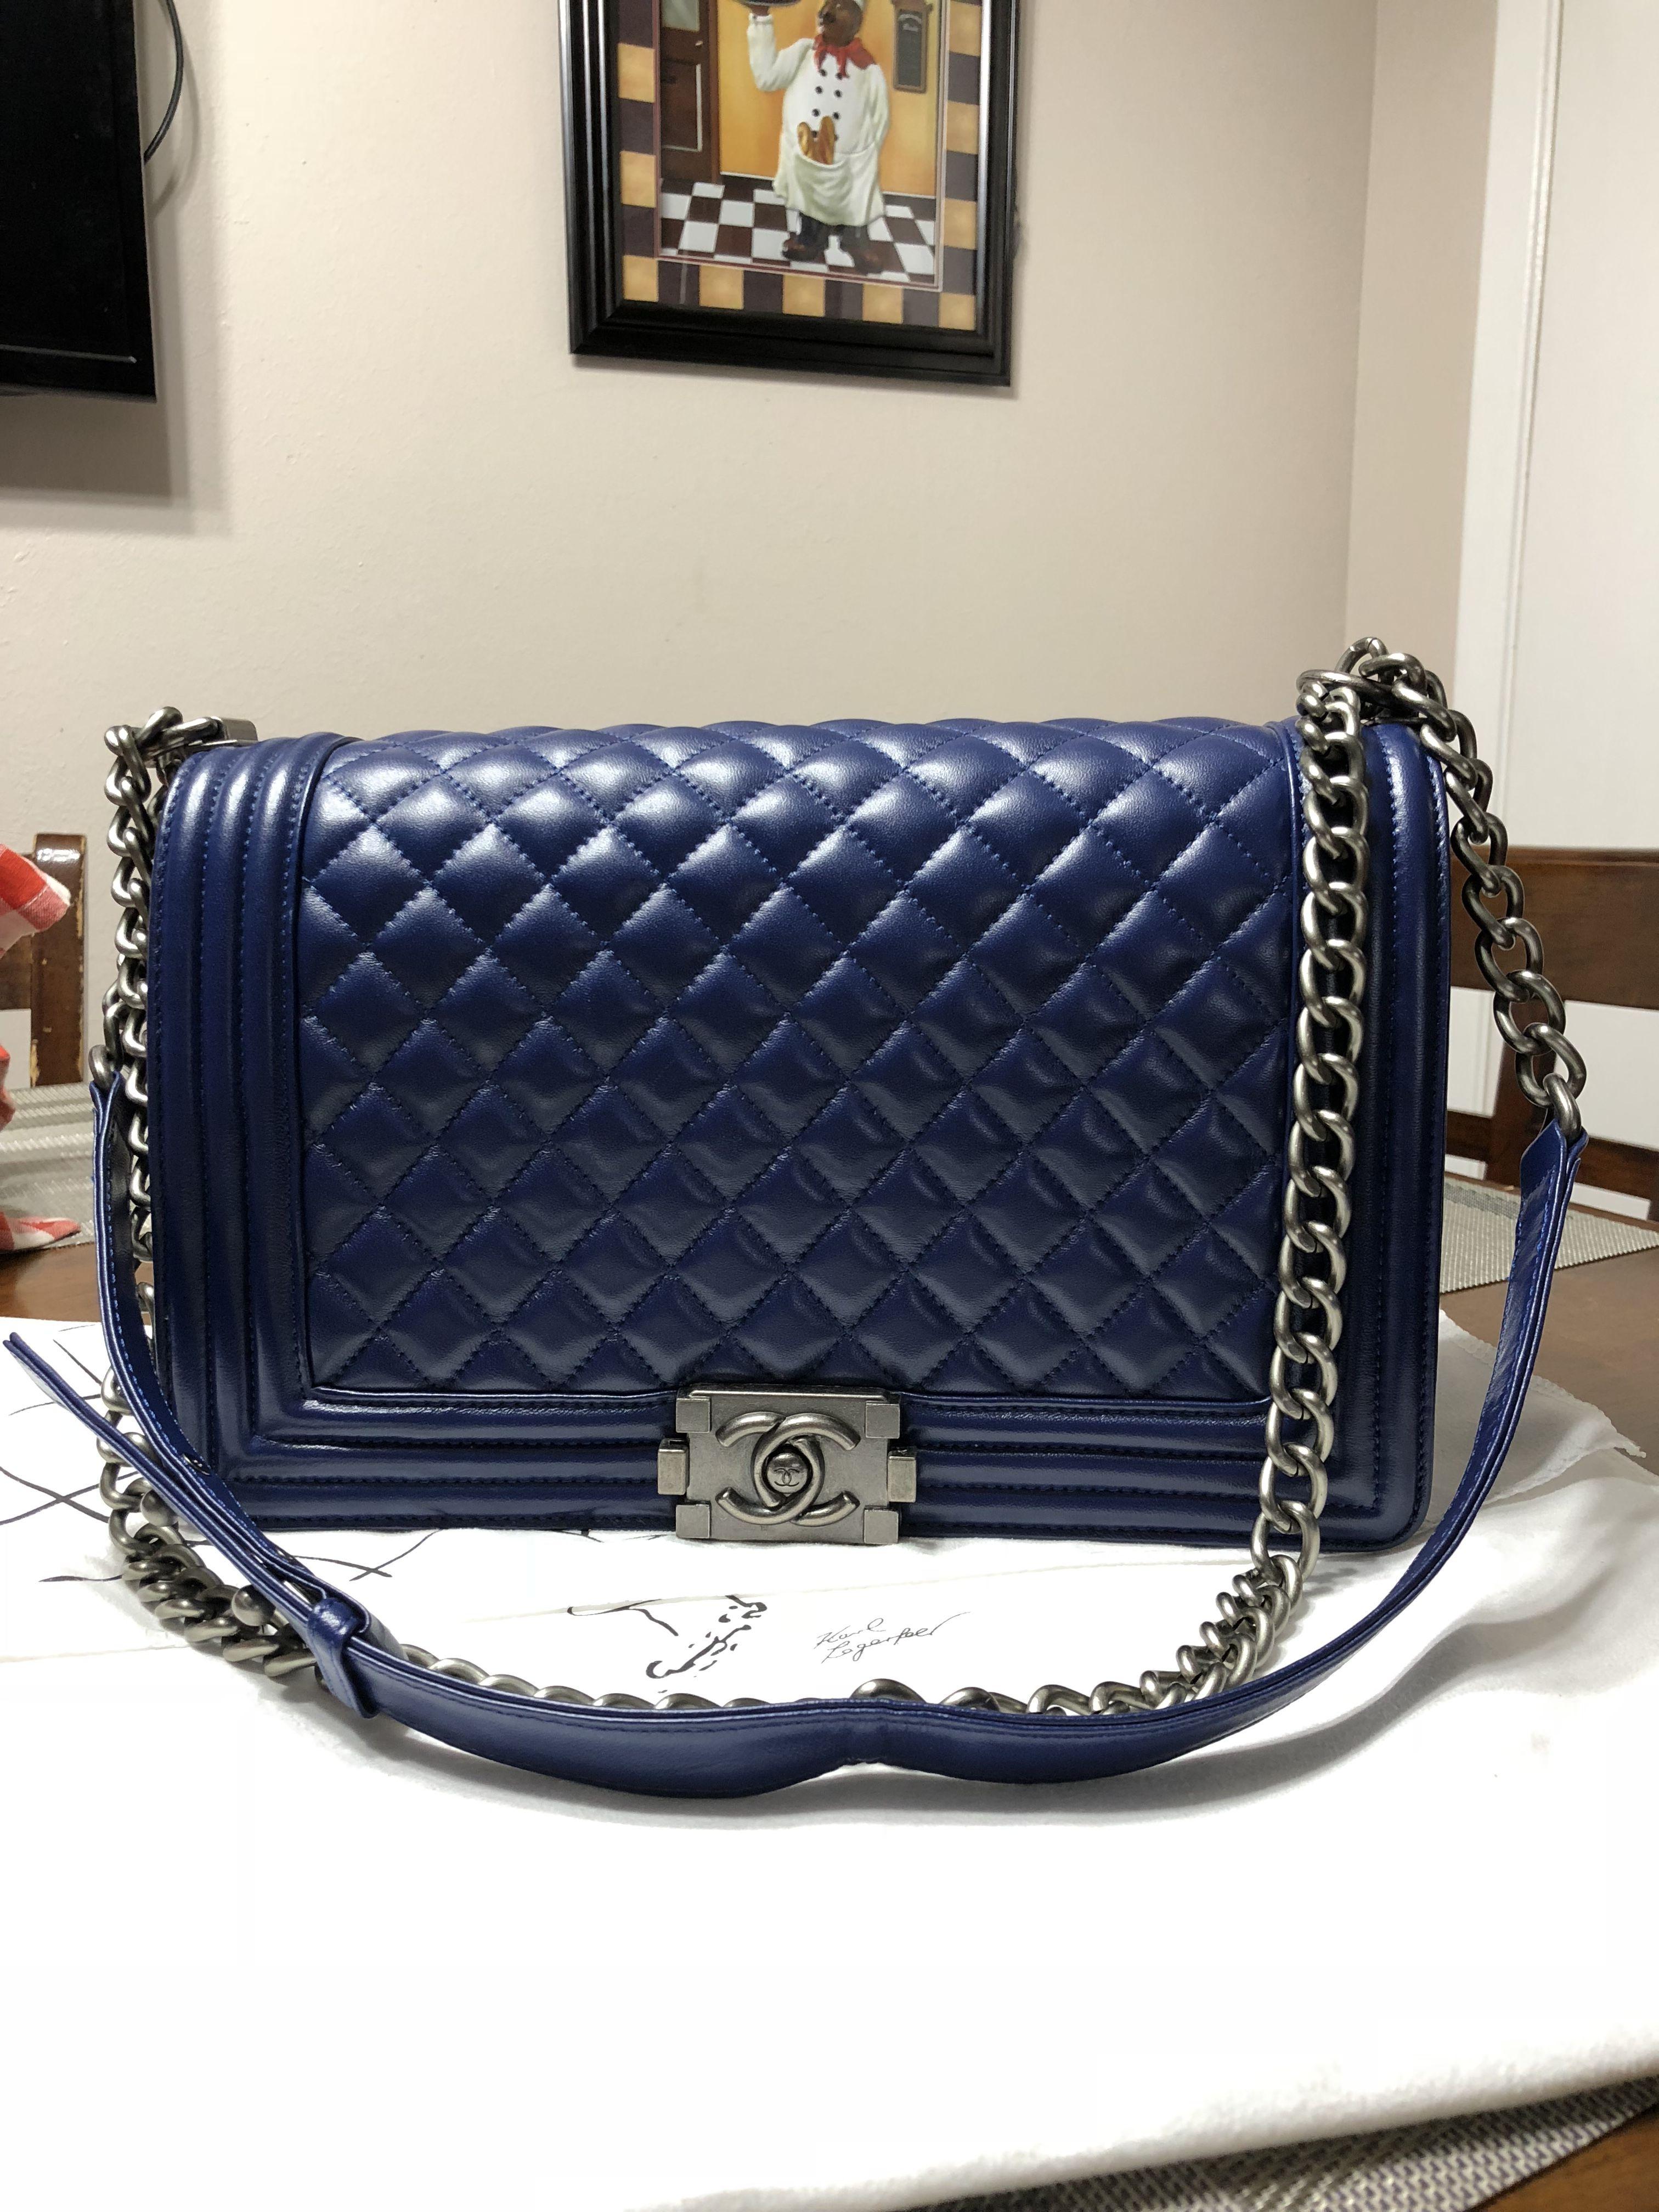 96801a57806d For sale size 30 cm medium Le boy | 4 the love of handbags | Chanel ...